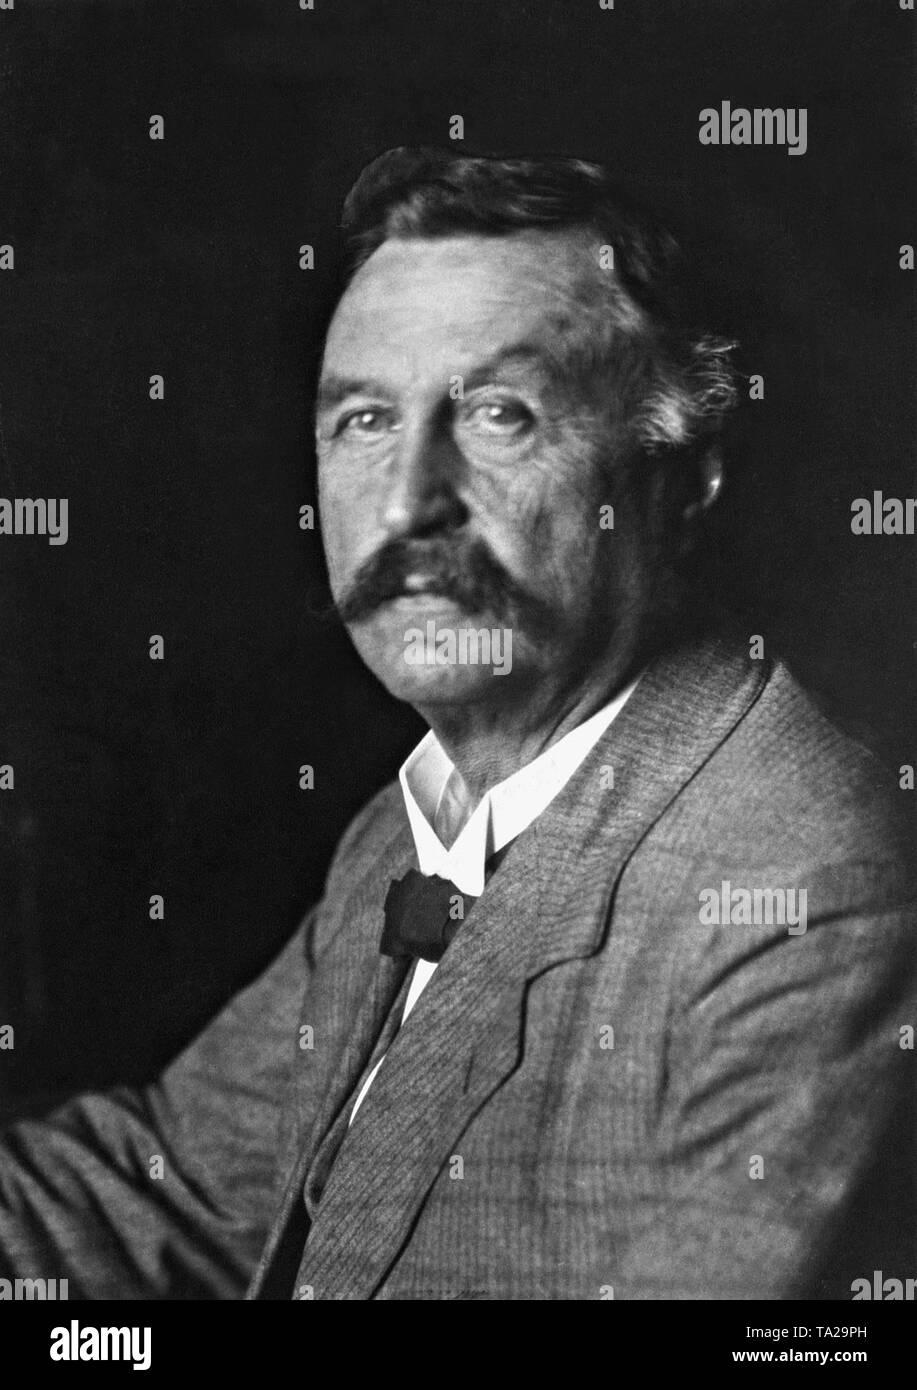 Konstantin Fehrenbach (1852-1926), a German jurist and politician. - Stock Image